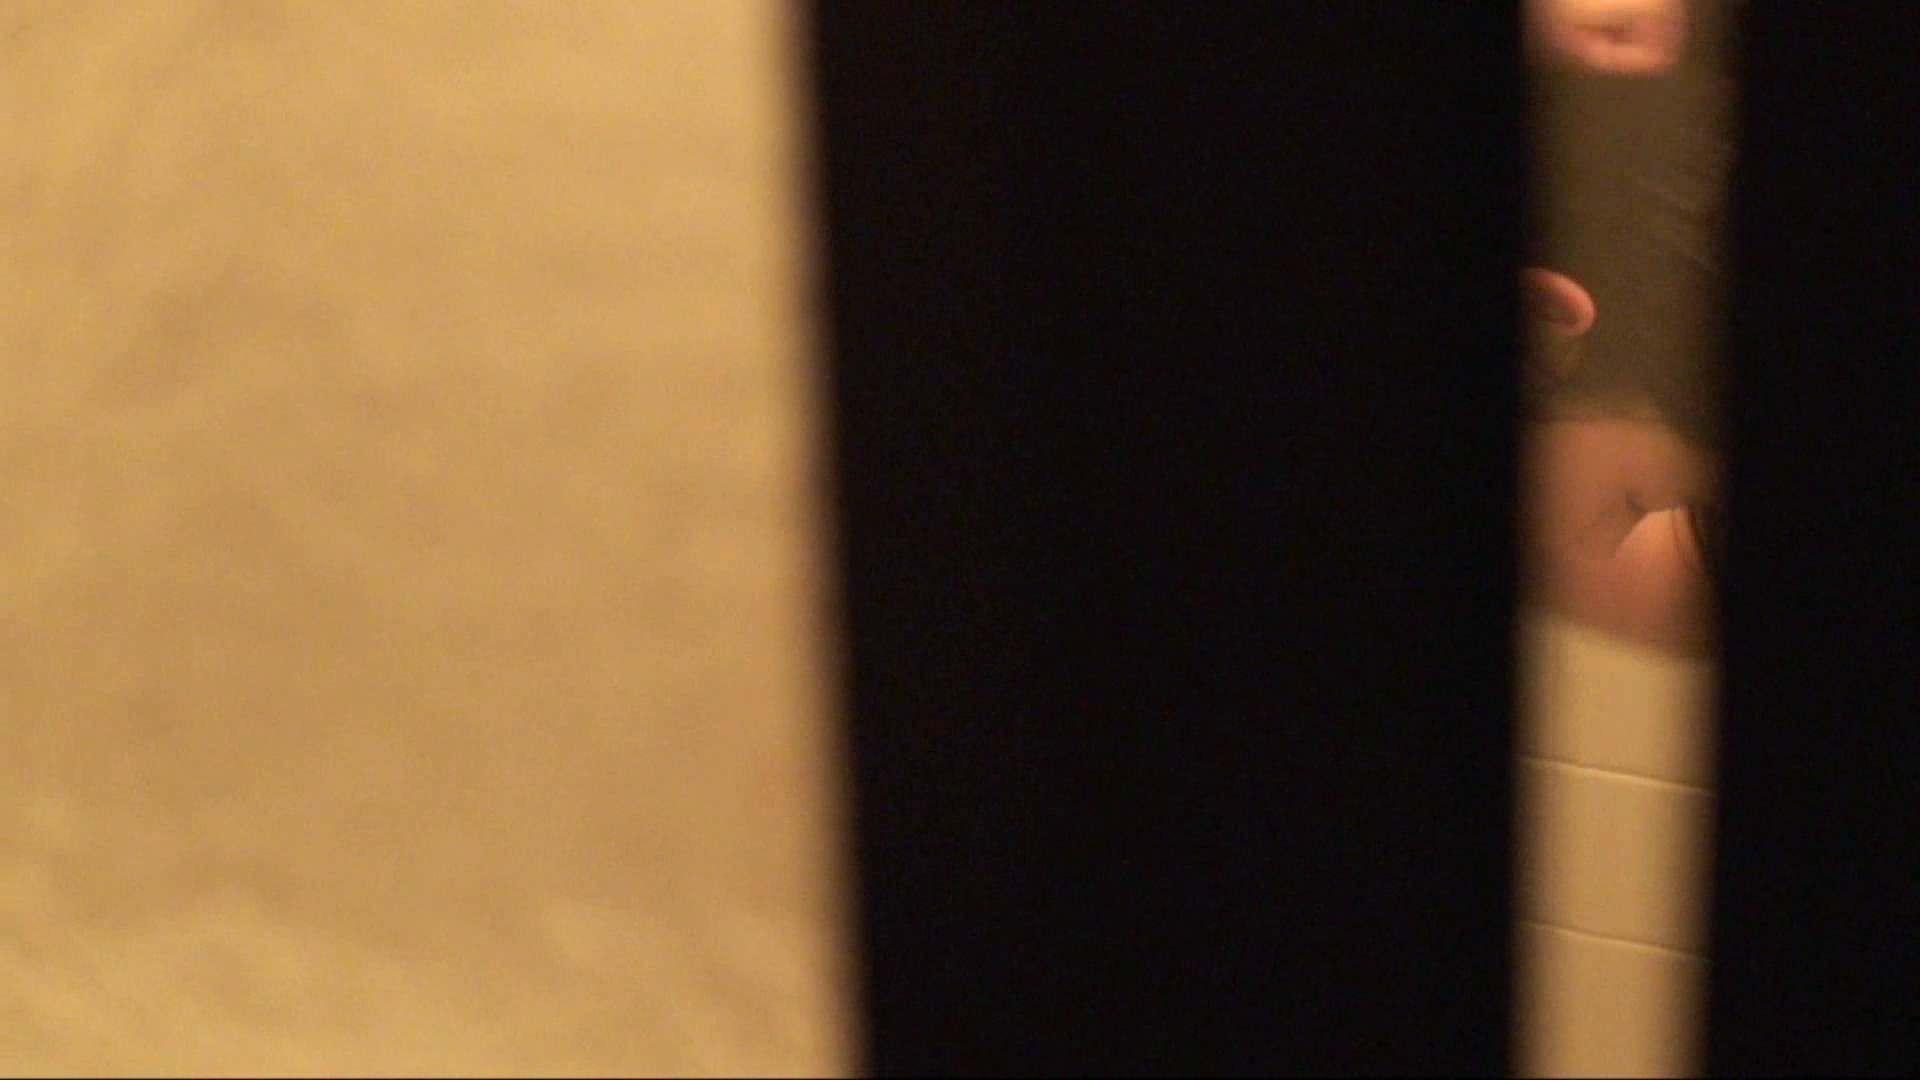 vol.02超可愛すぎる彼女の裸体をハイビジョンで!至近距離での眺め最高! OLの実態 盗み撮りオマンコ動画キャプチャ 103pic 62